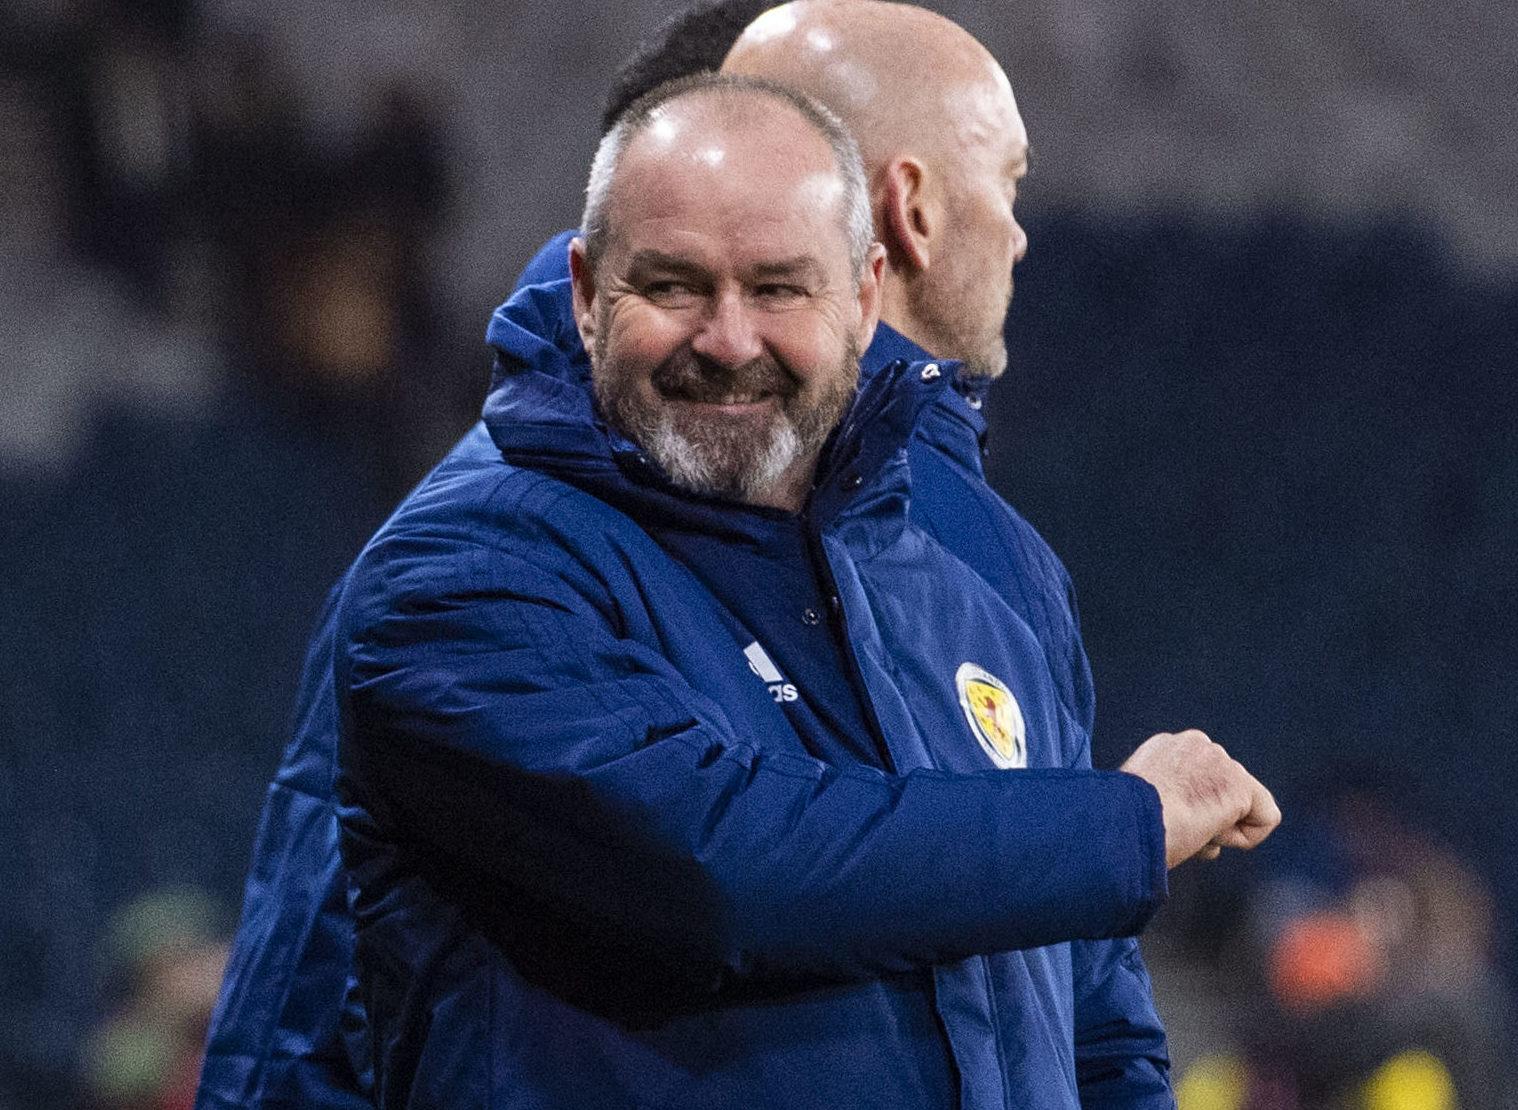 Scotland manager Steve Clarke celebrates at full-time.